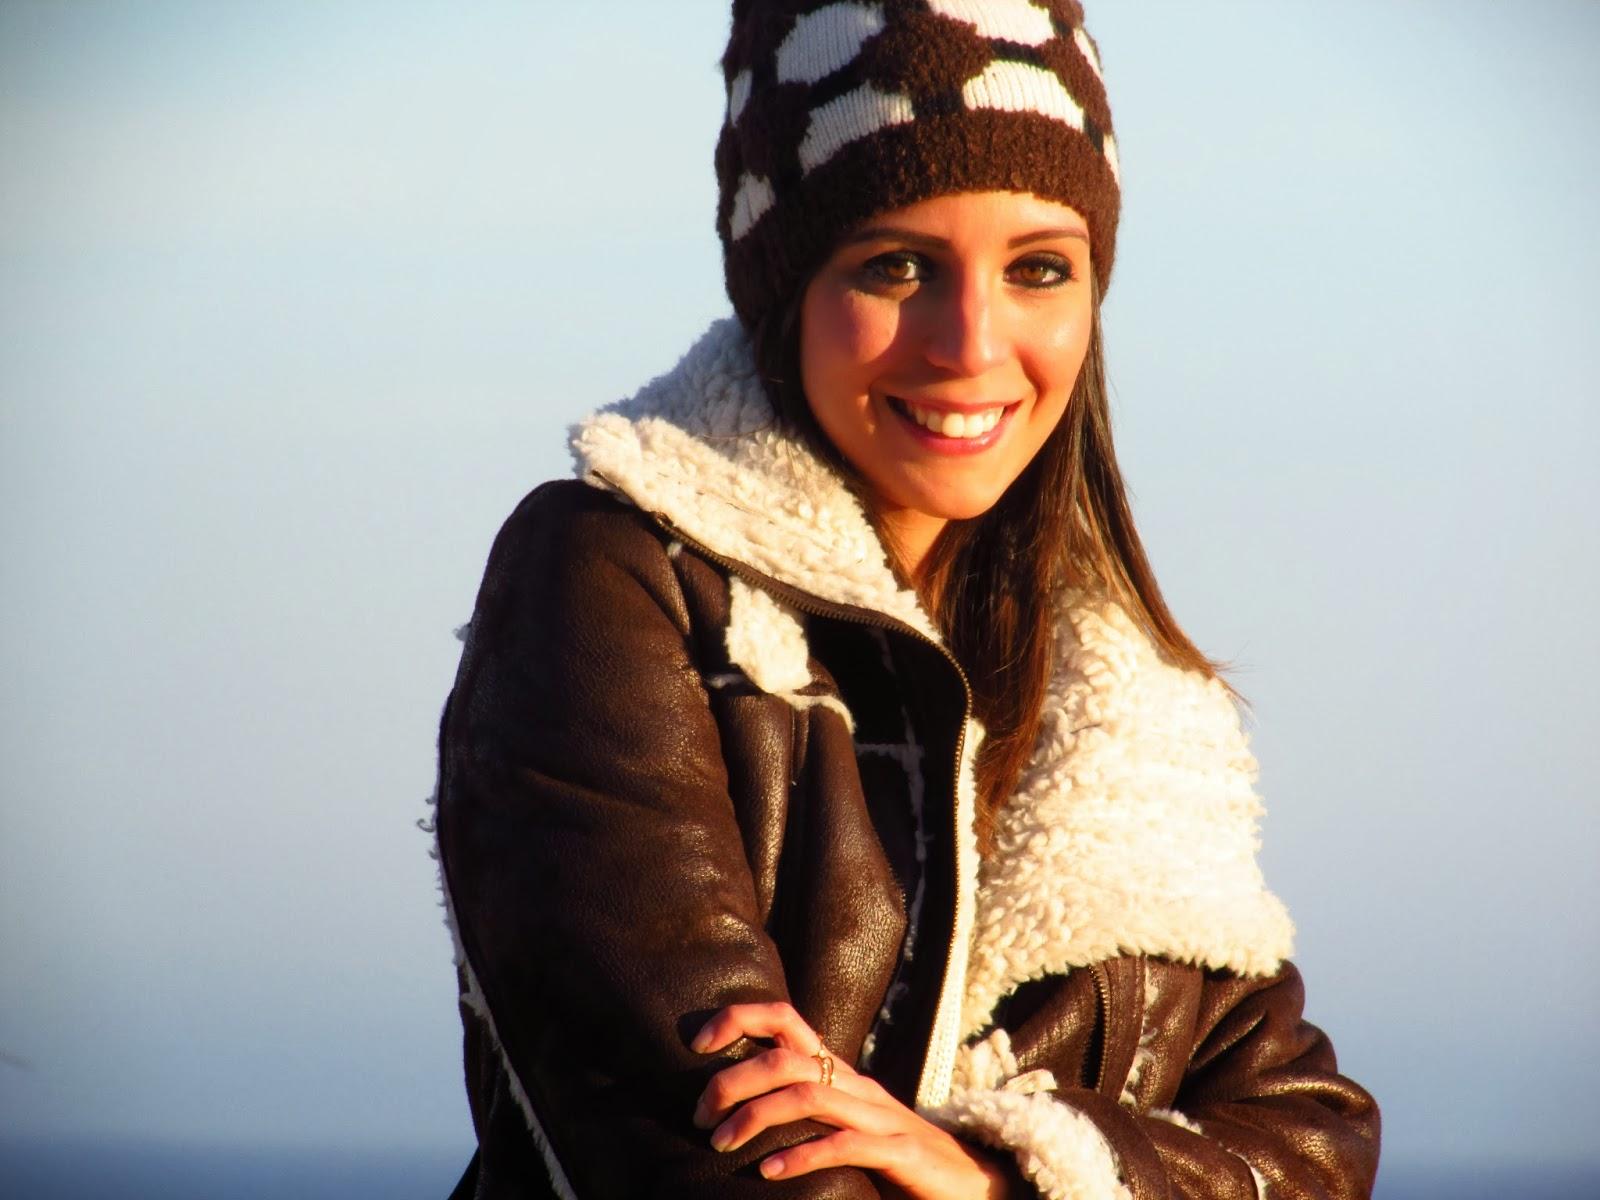 cristina style street style fashion blogger malagueña inspiration outft look tendencias moda